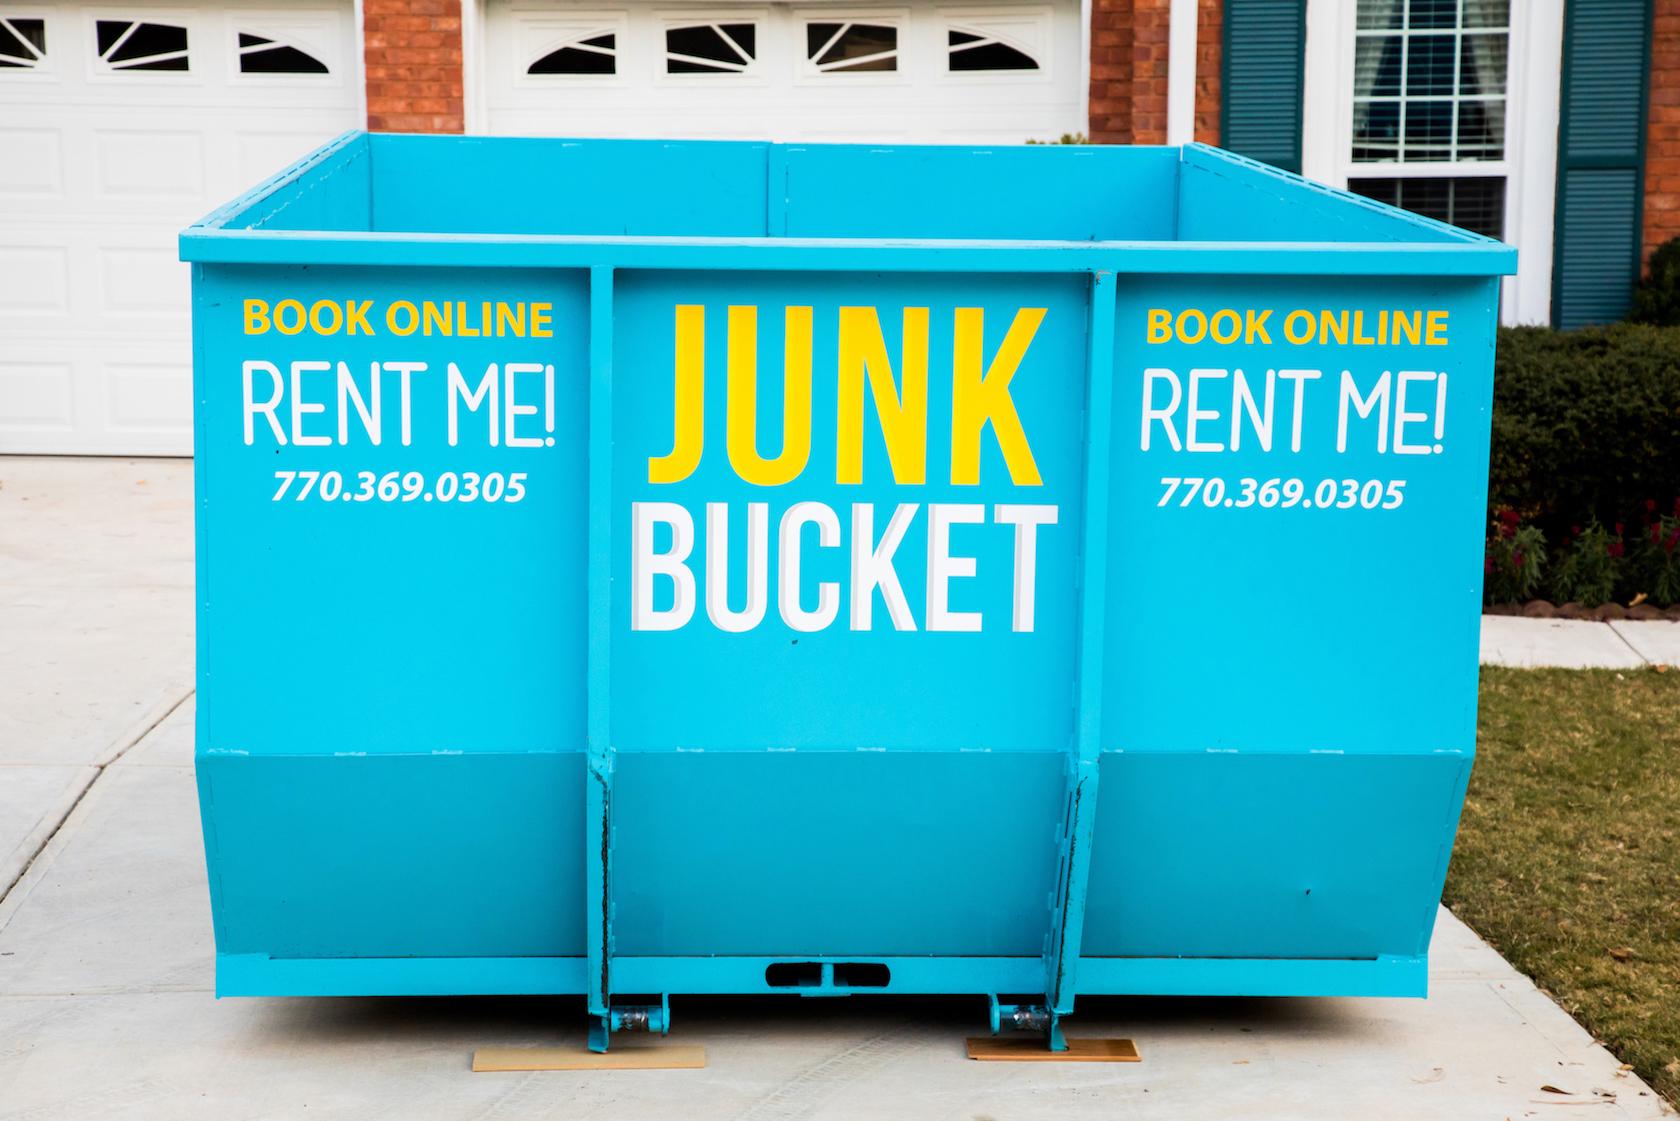 East Cobb Dumpster Rental  Junk Bucket Dumpster Rental